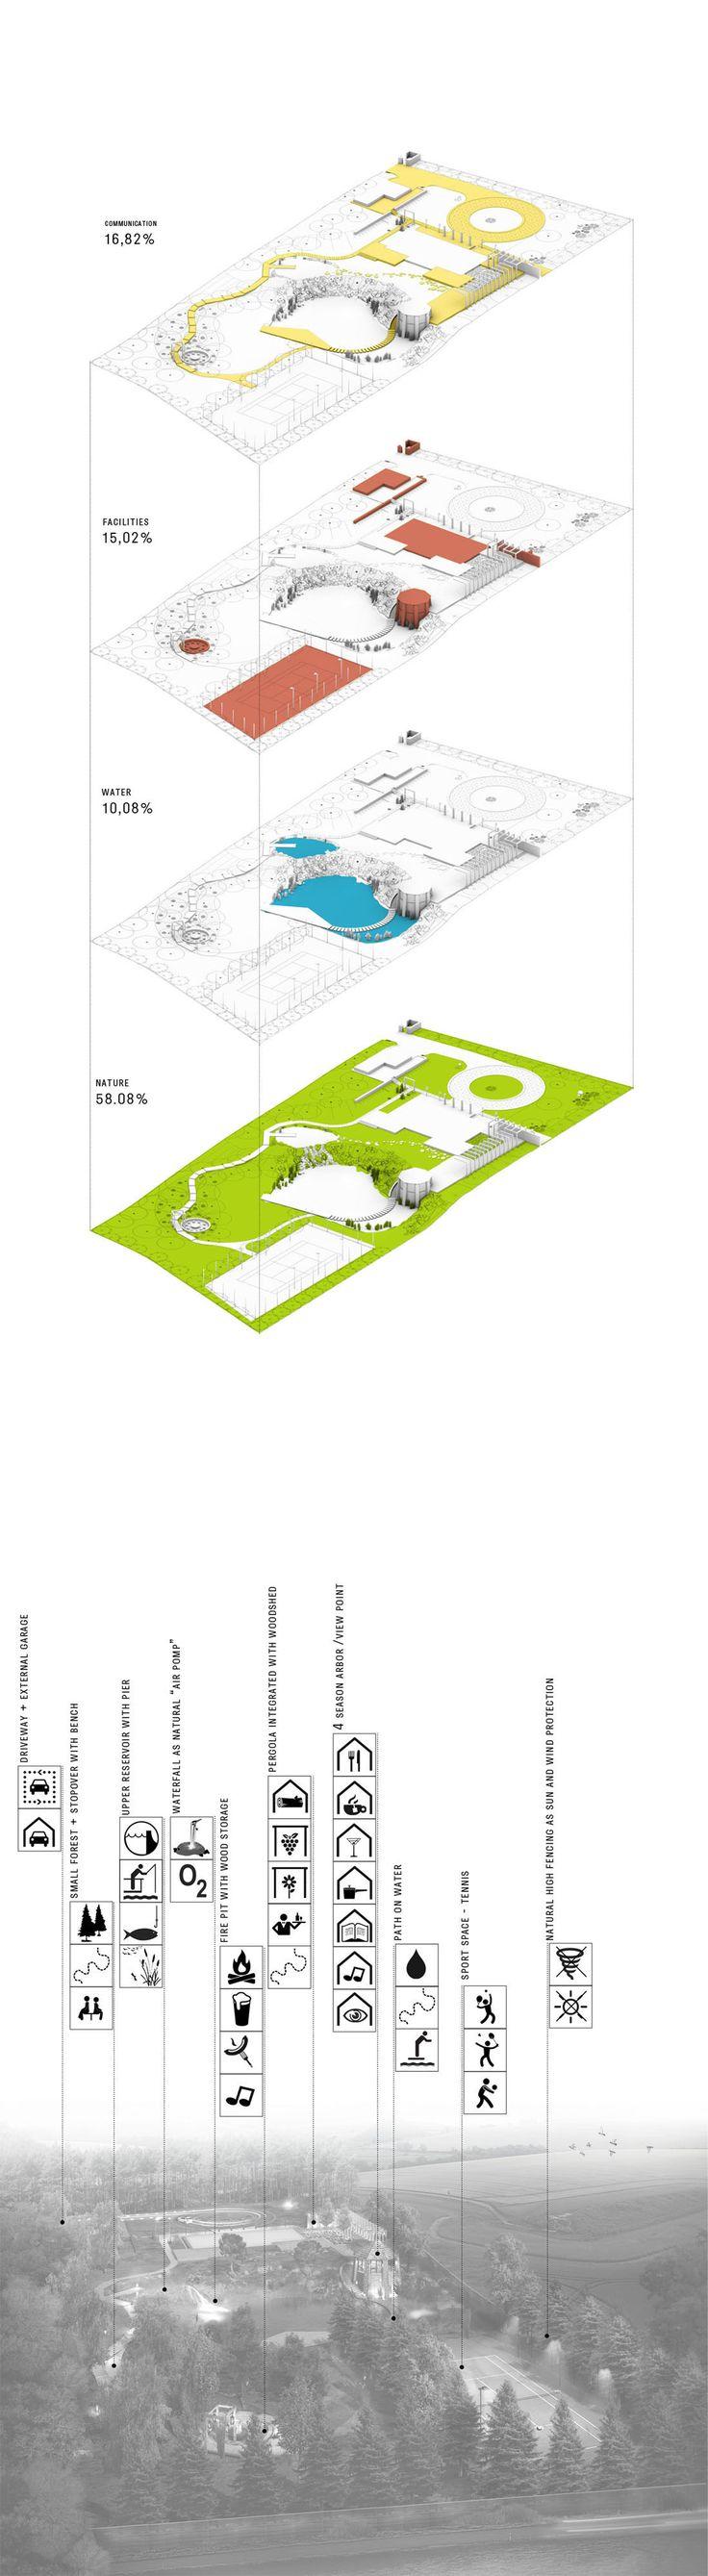 GreenStone Garden - Landscape project  Konrad Wójcik Aalborg, Denmark